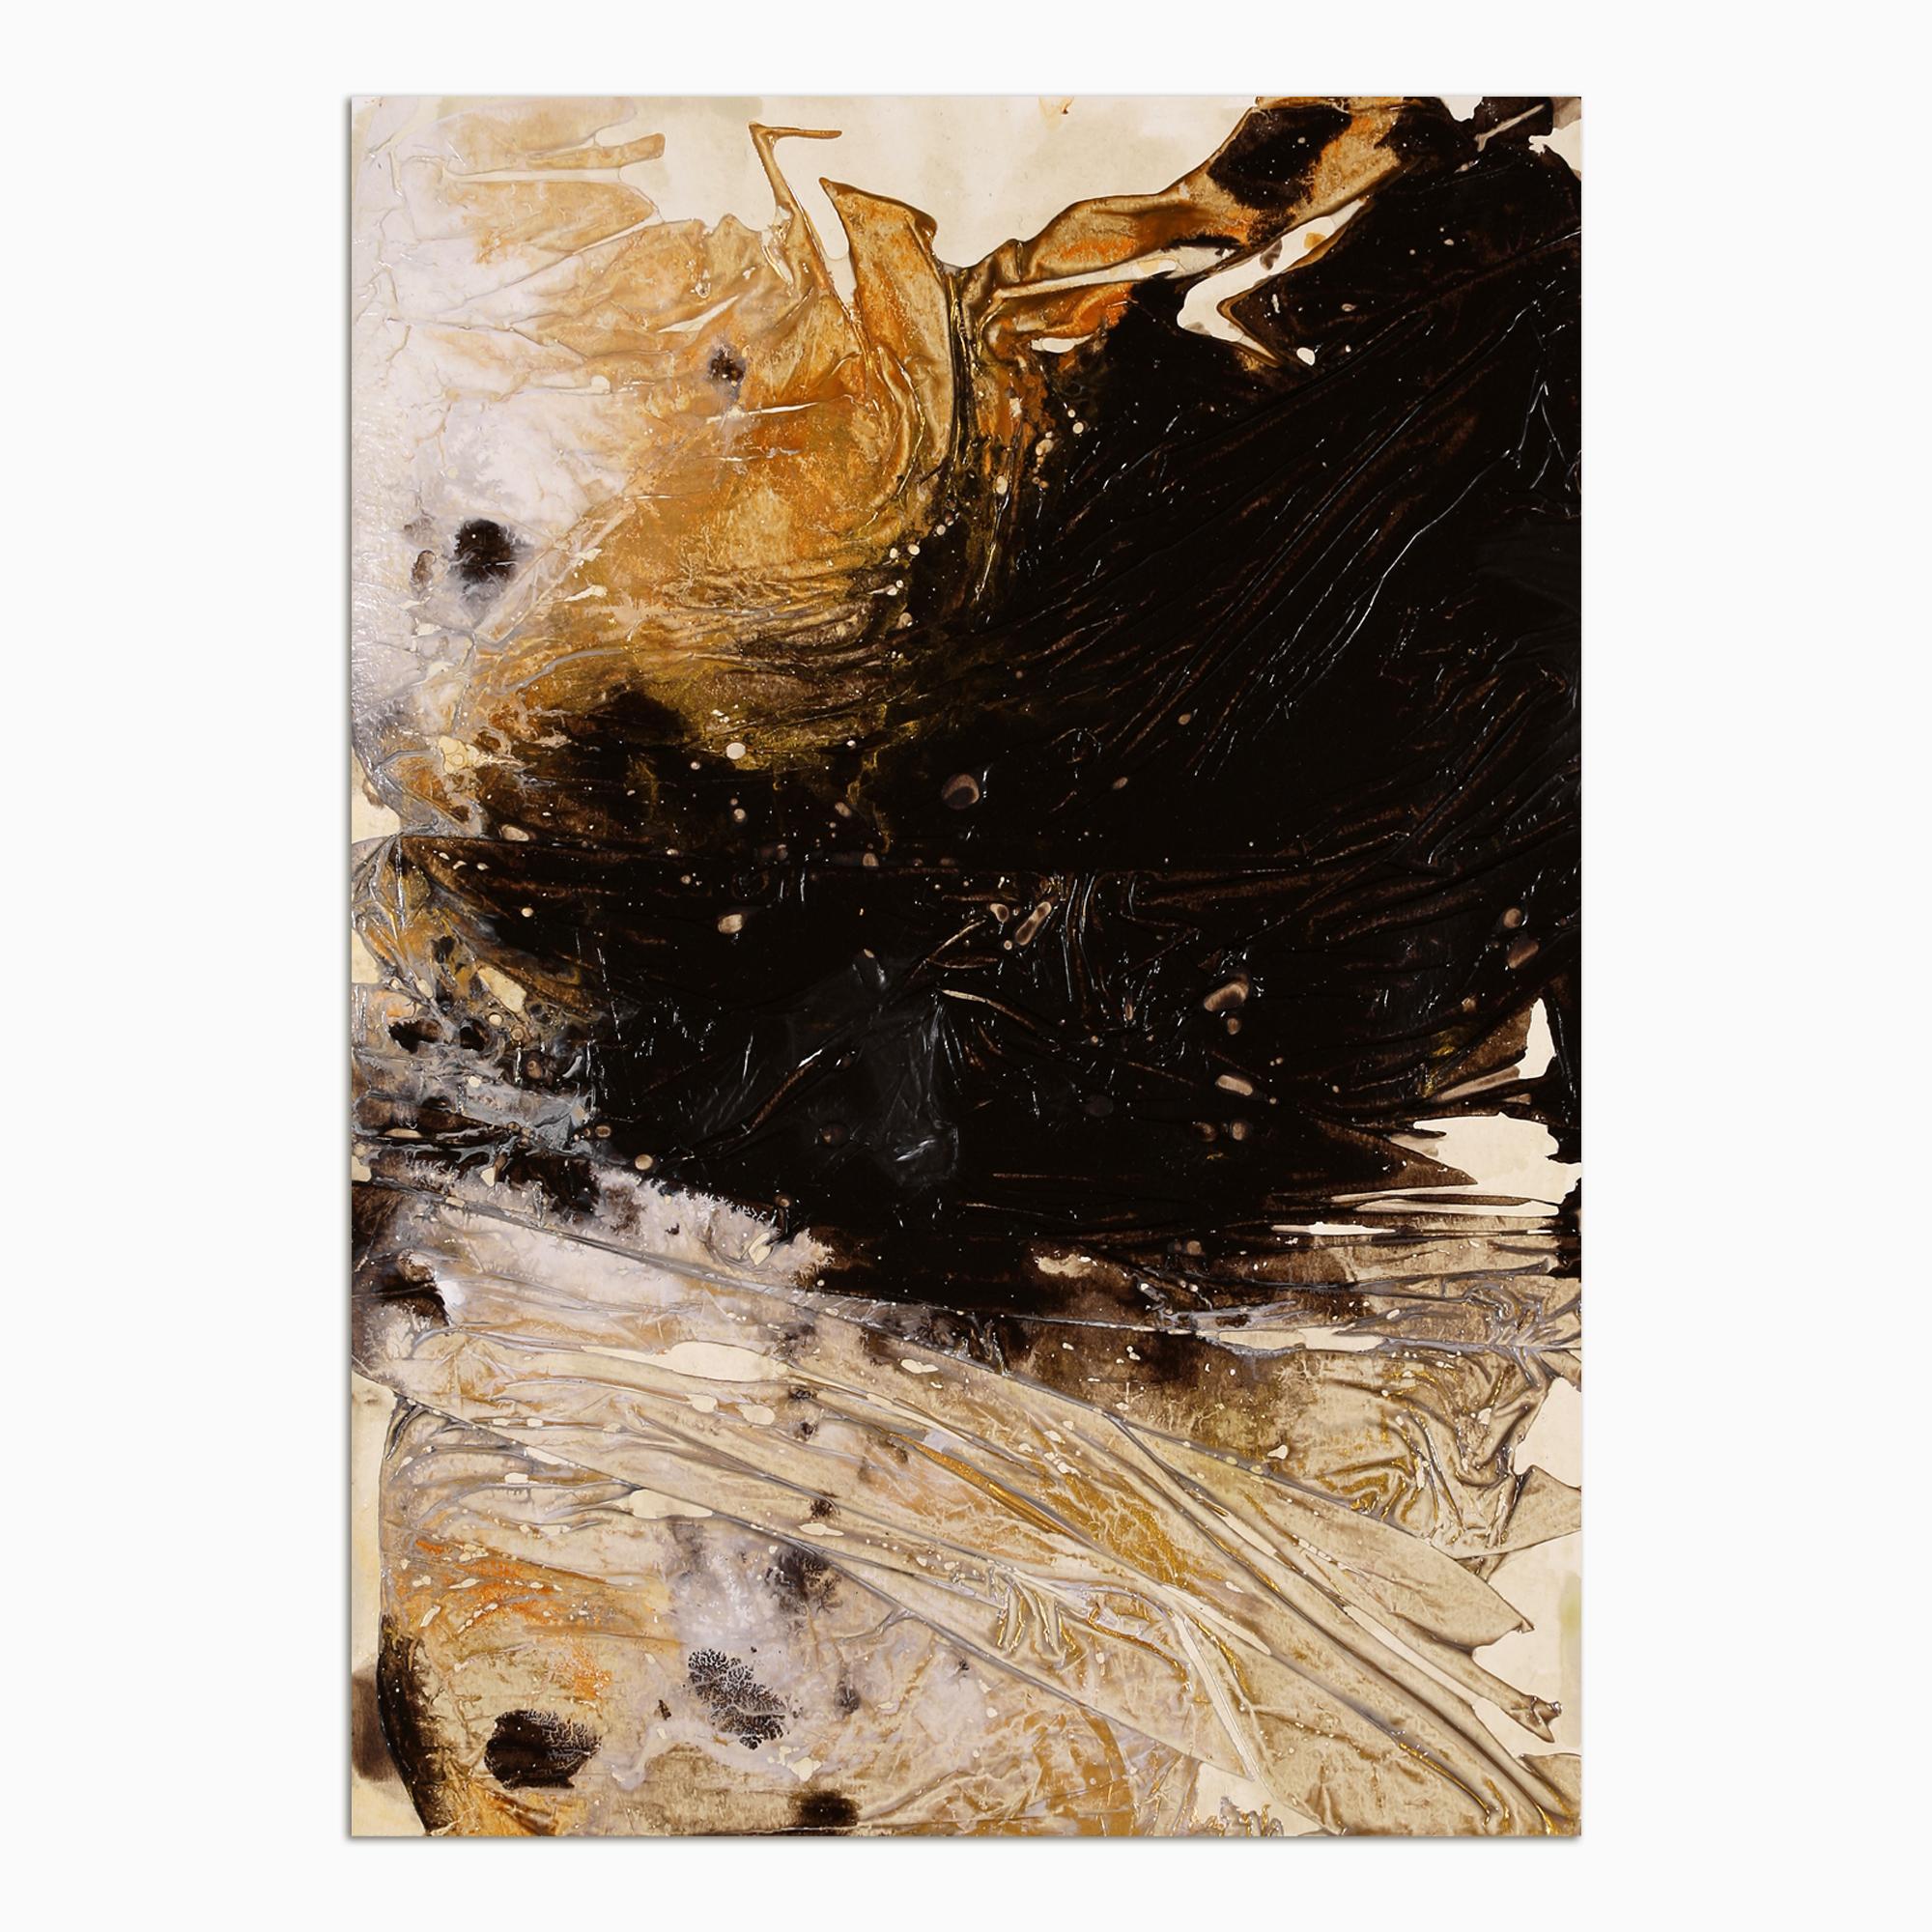 692_jay-paganini_abstract-art_on-paper.jpg